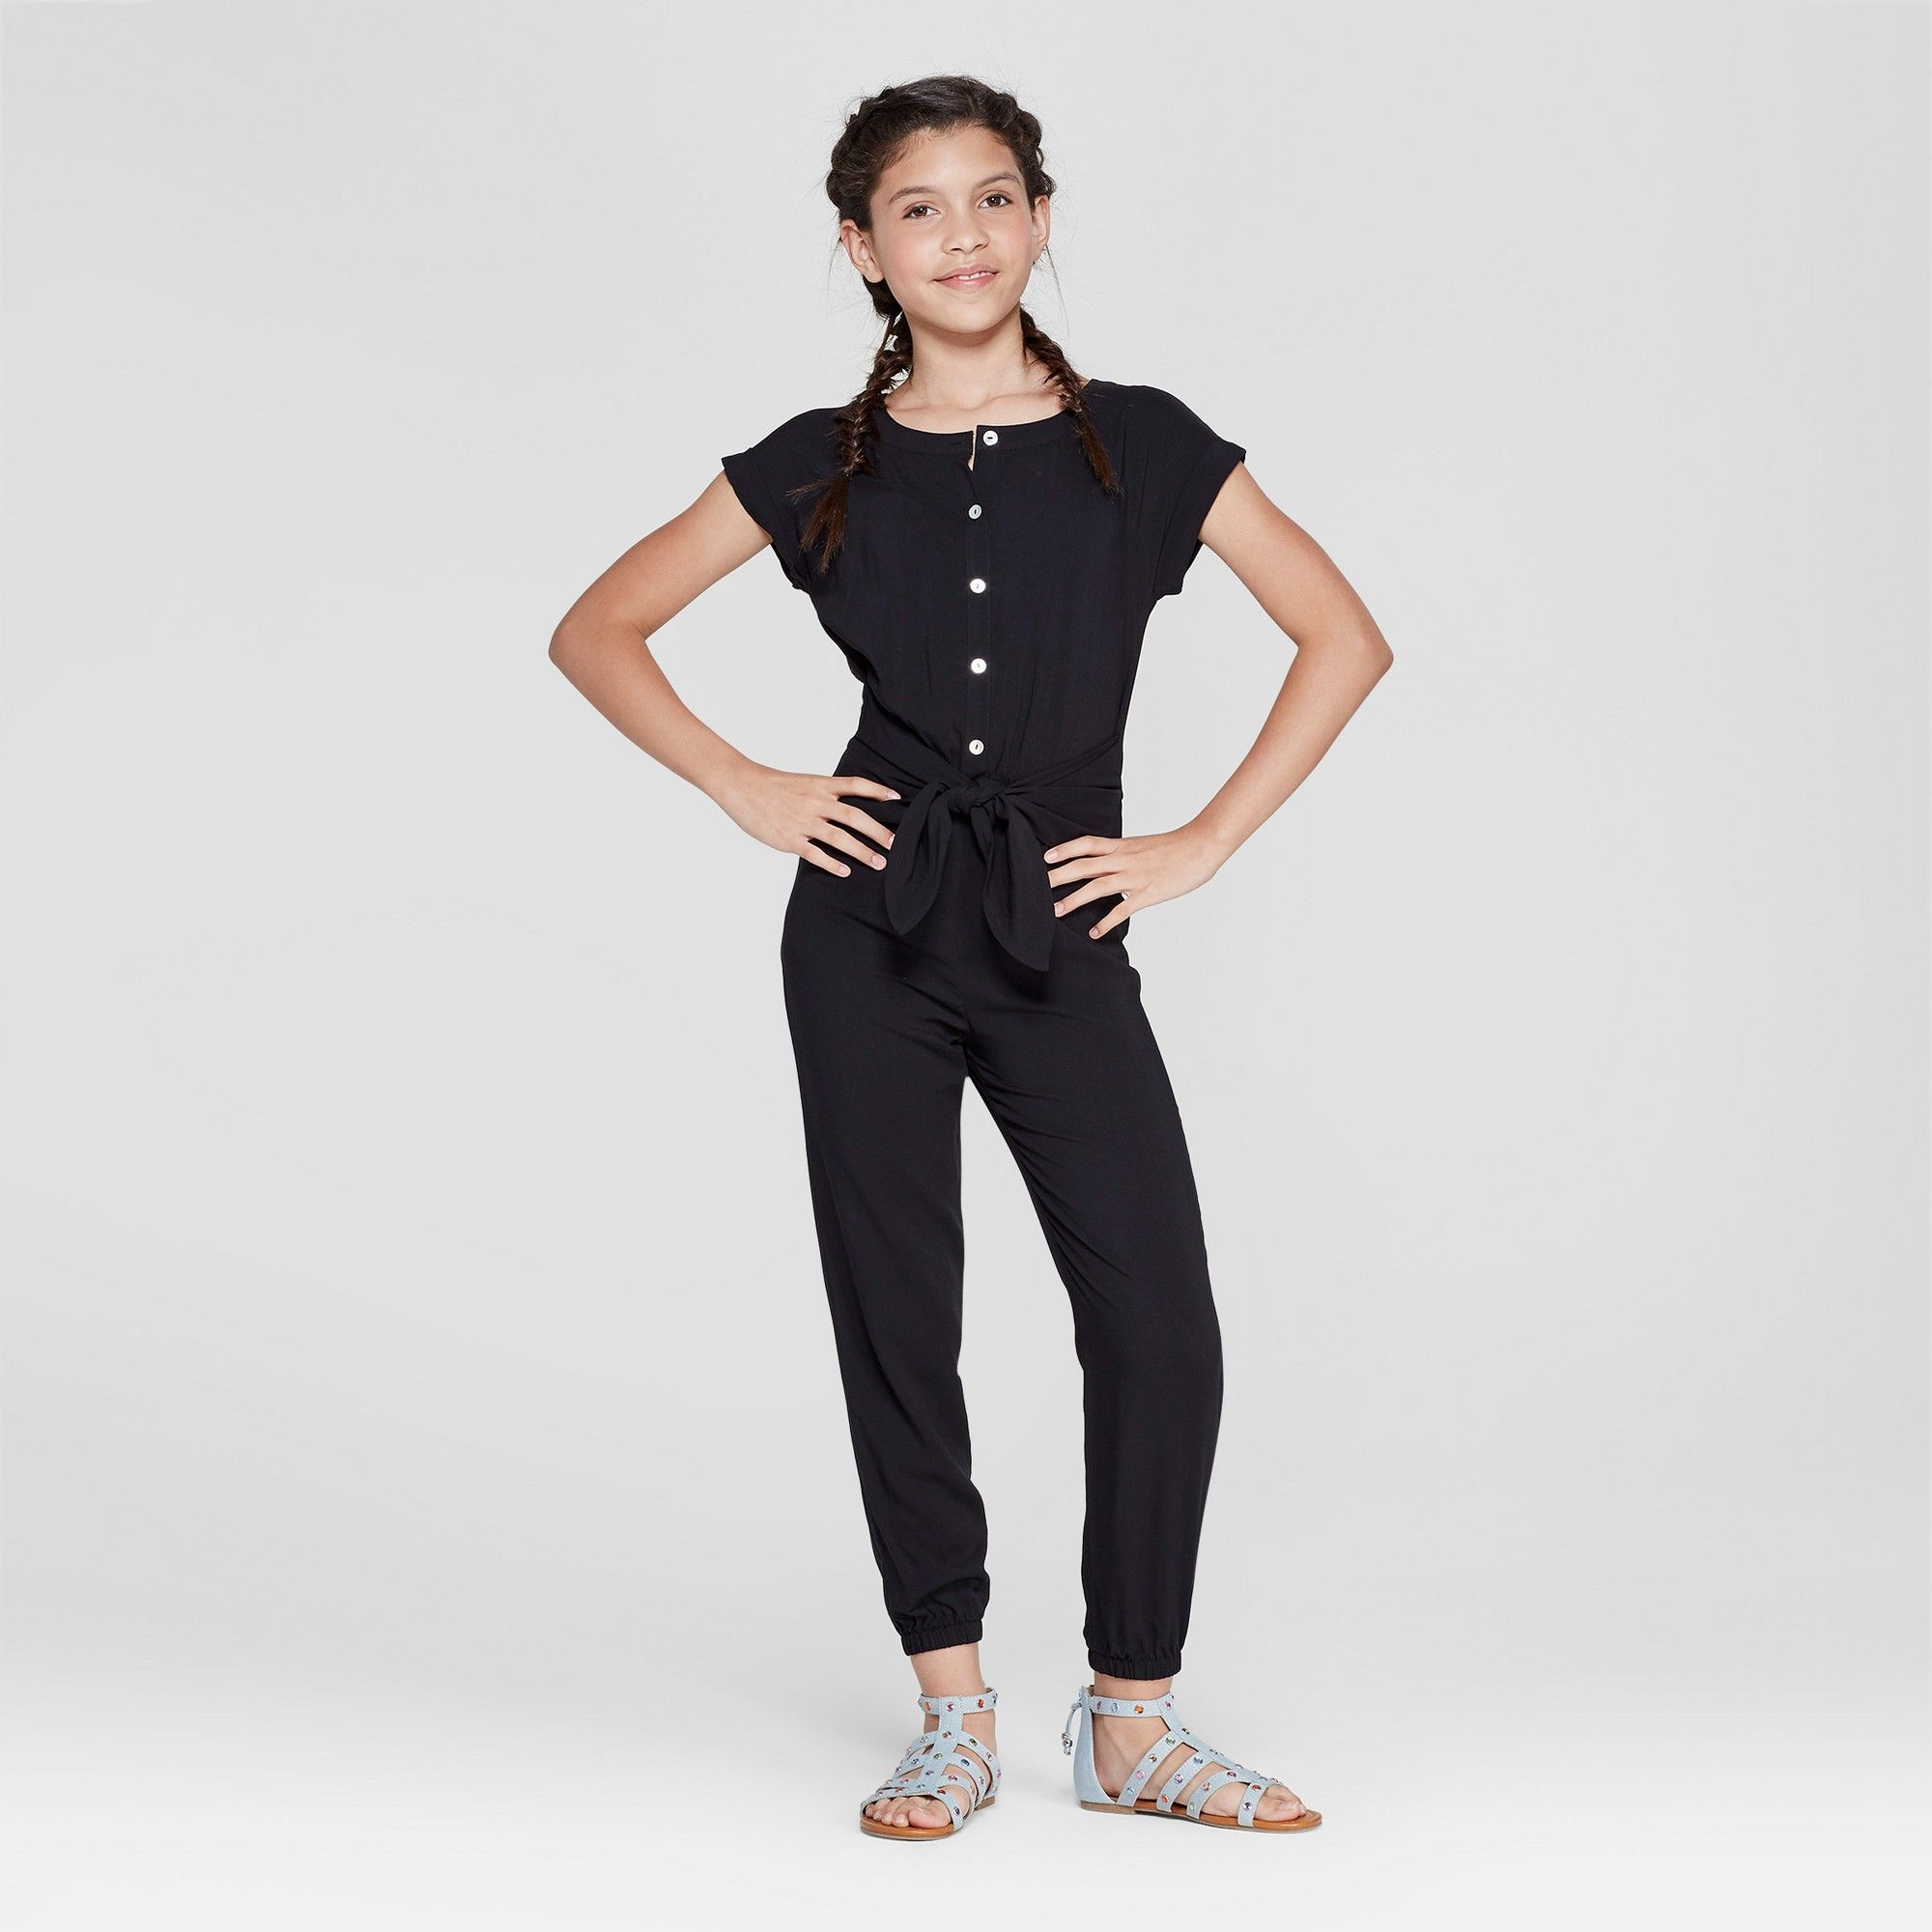 Girls jumpsuit art class black xs jumpsuits for girls